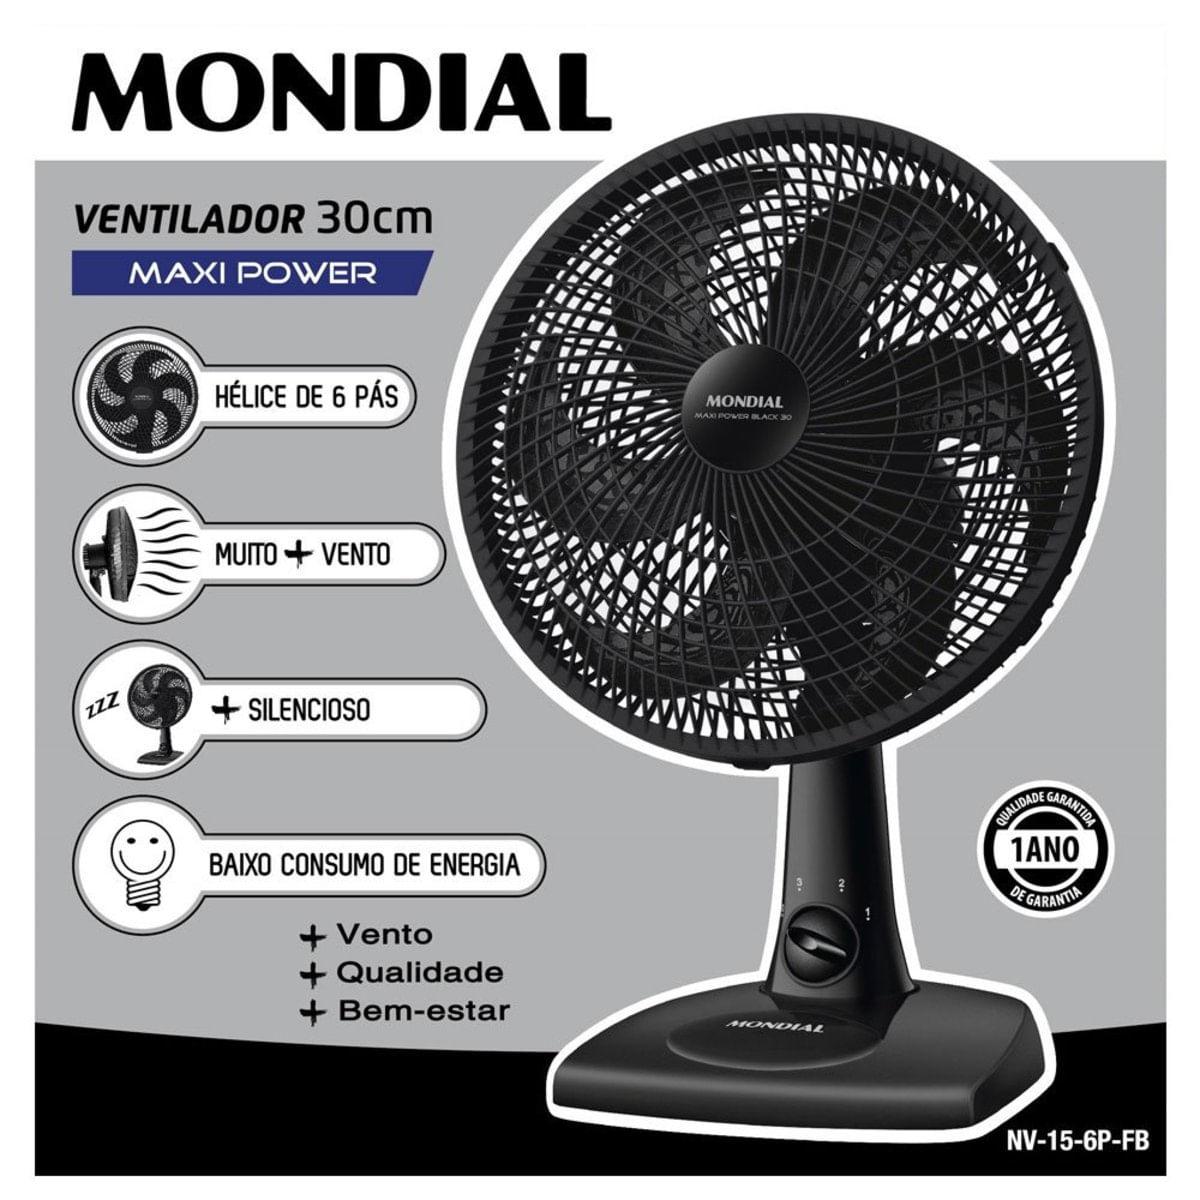 Imagem de Ventilador de Mesa Mondial 6 Pás 30cm - NV-15